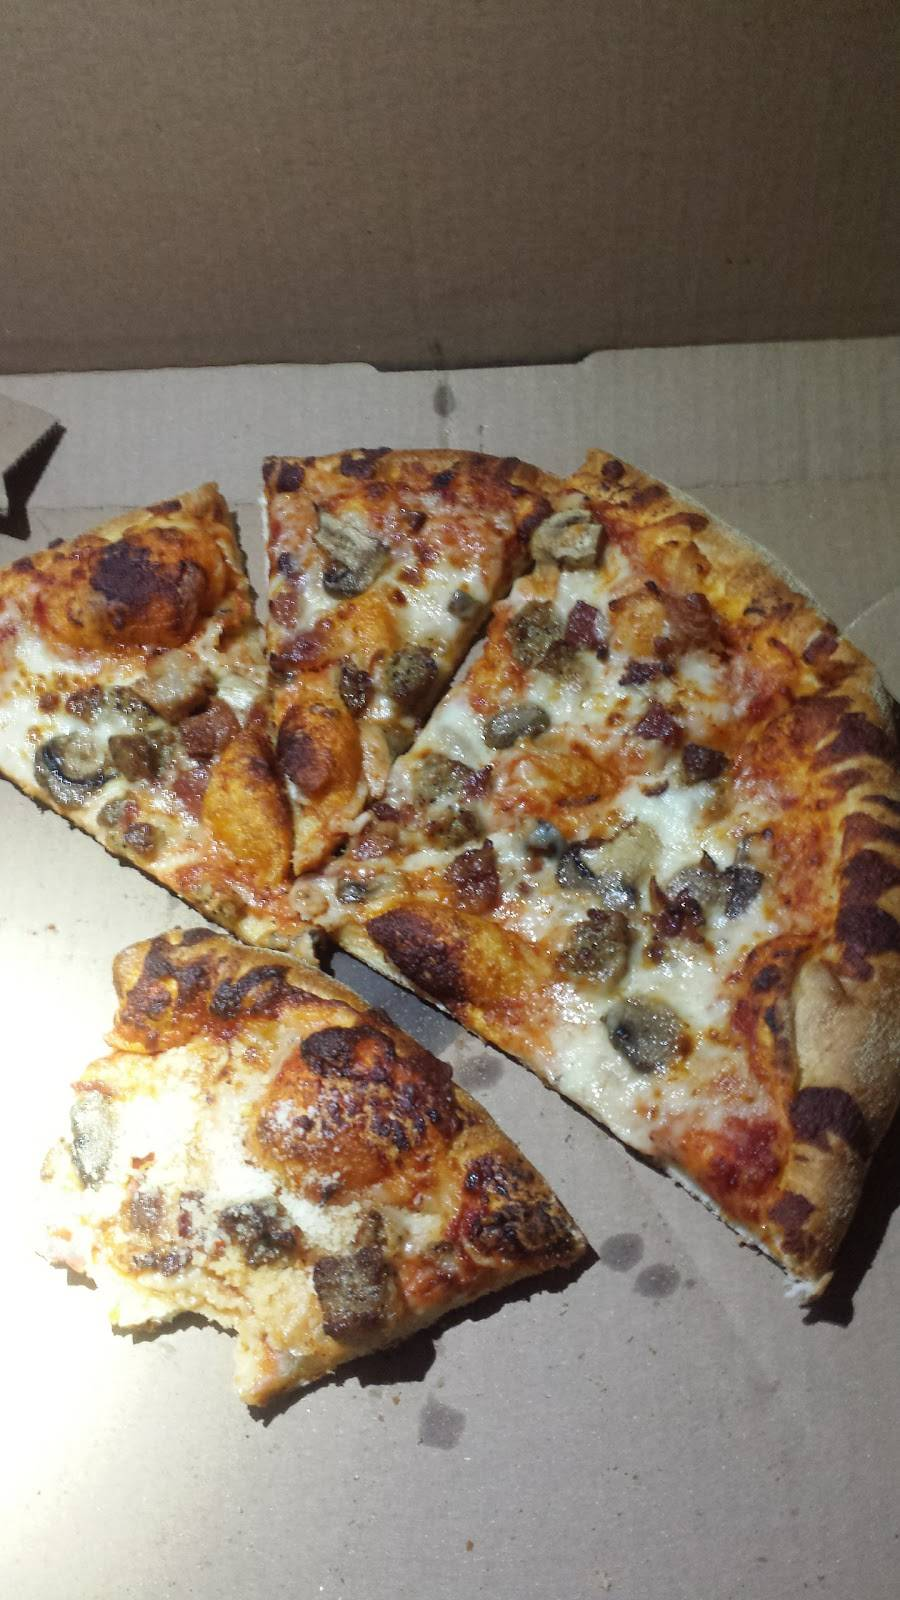 Domino S Pizza Meal Delivery 305 S Hutchins St Lodi Ca